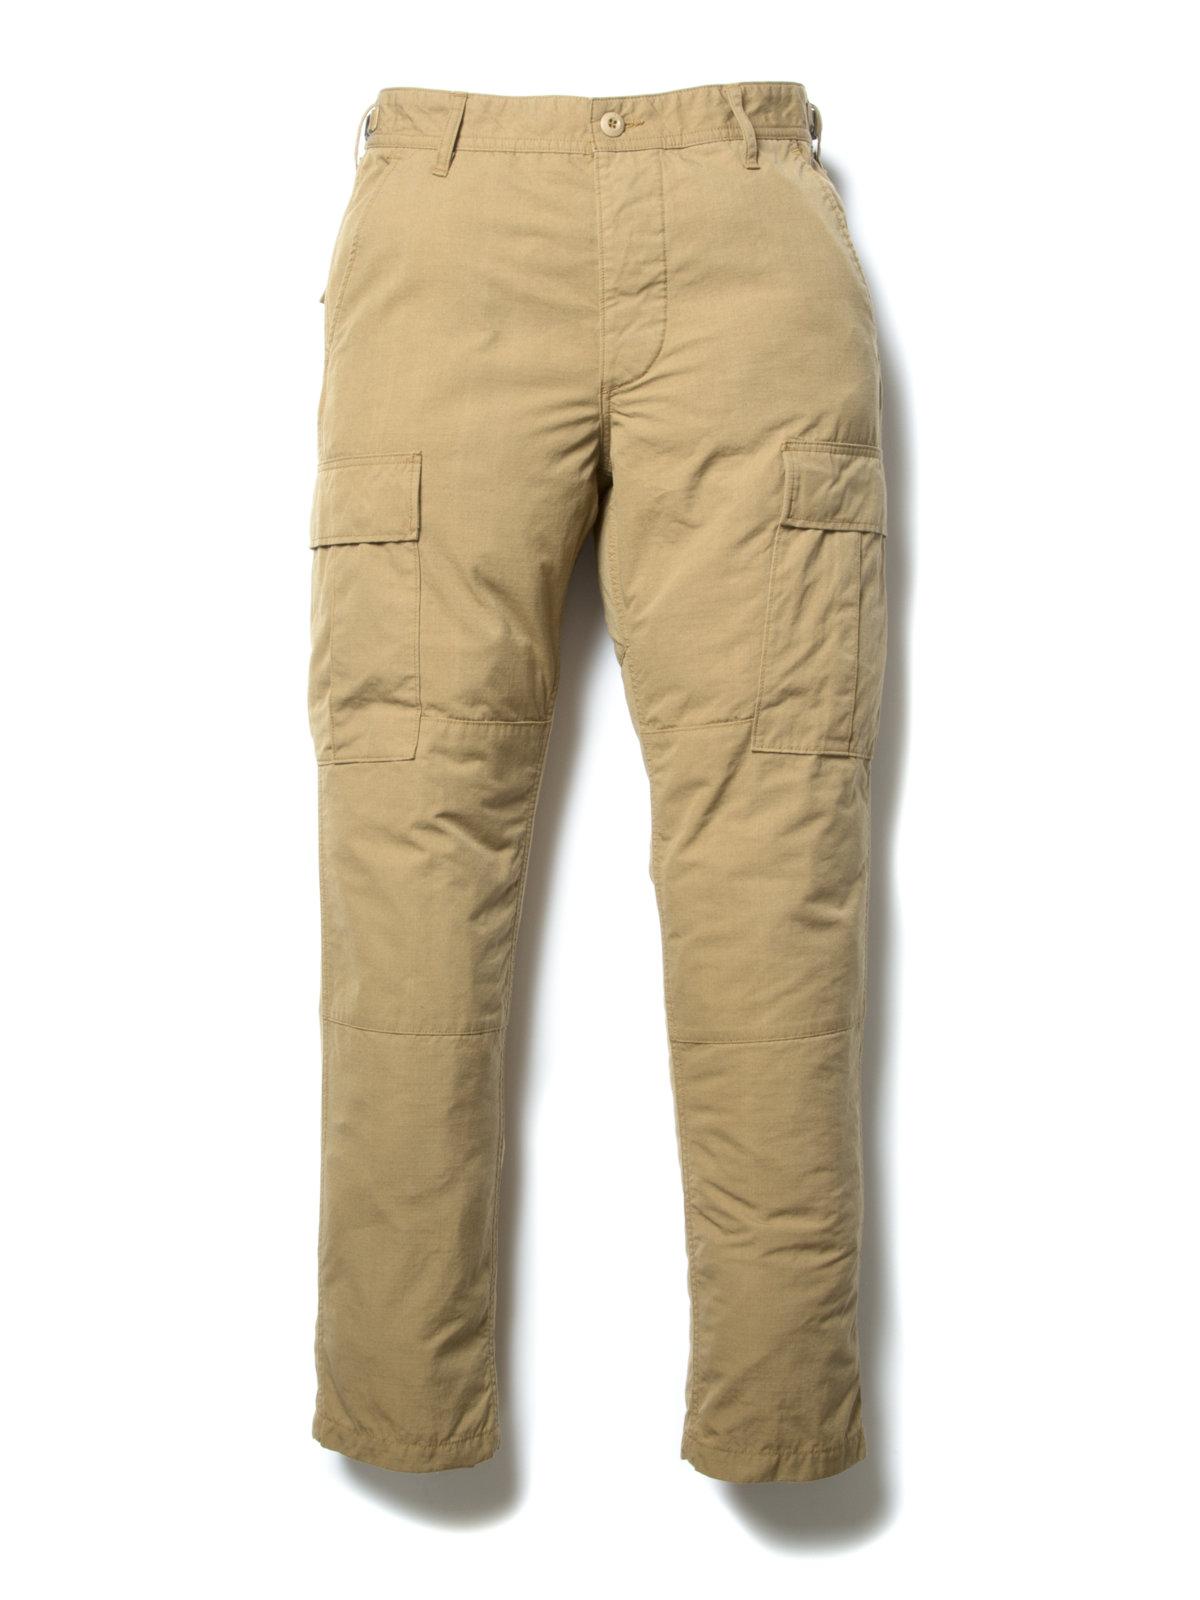 Ripstop Cargo Trousers-Beige-